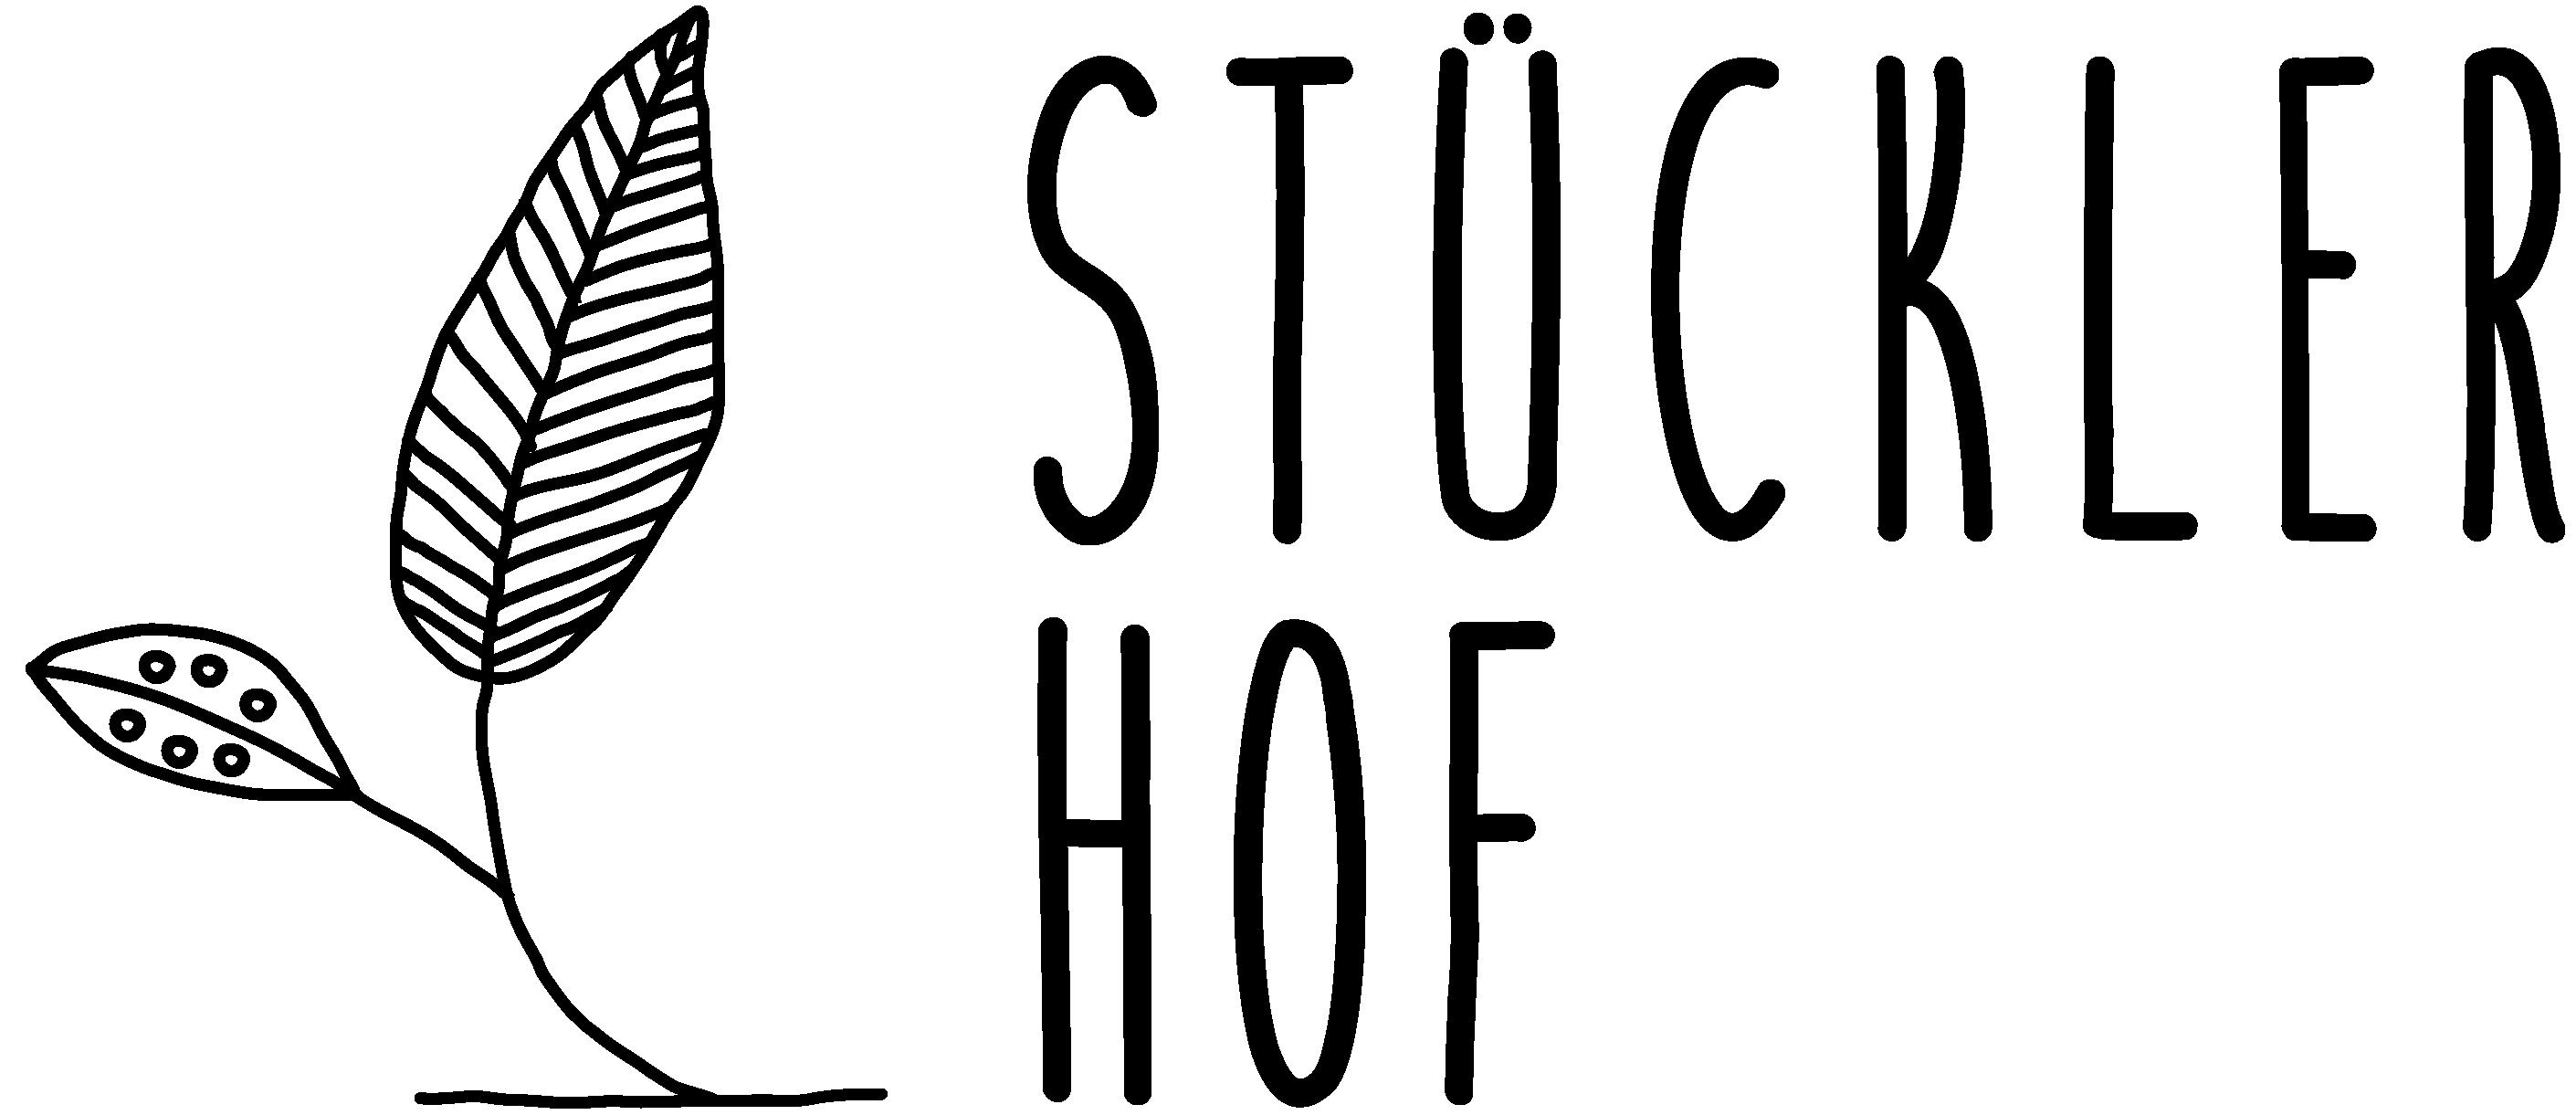 Stuecklerhof_Logo_bold